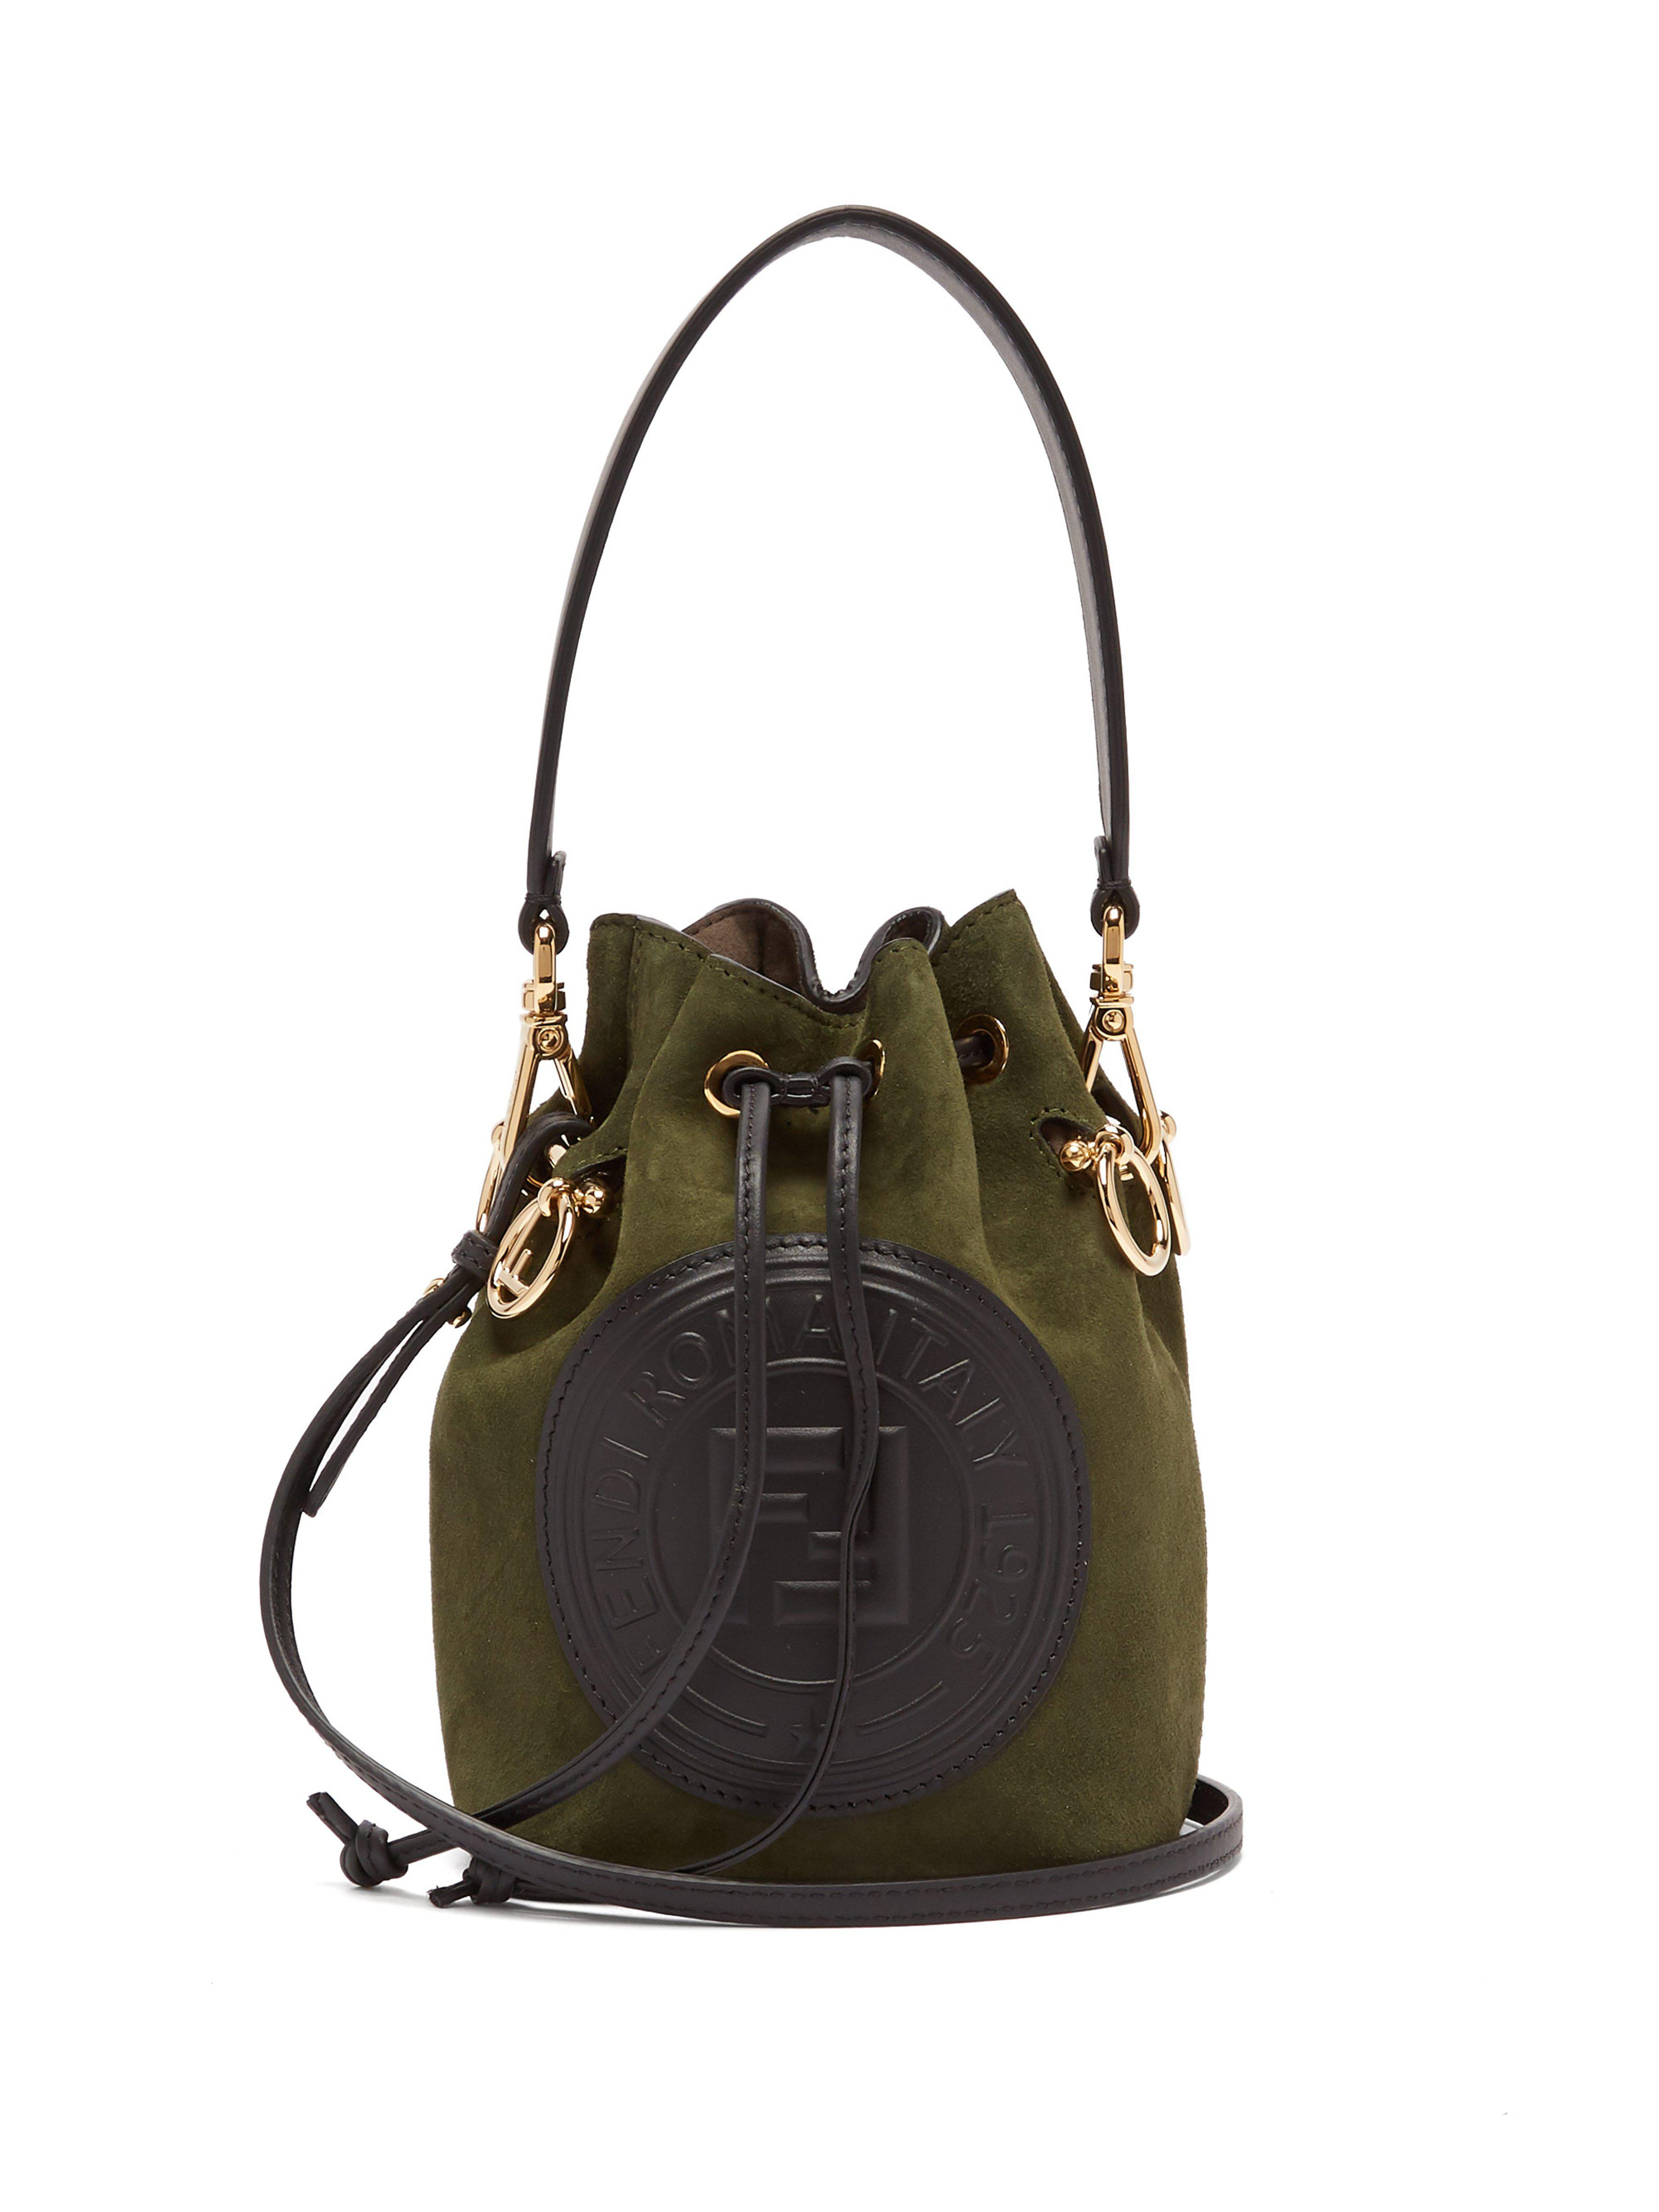 41c1ac5130c7 Fendi Mon Tresor Mini Suede Bucket Bag in Green - Lyst